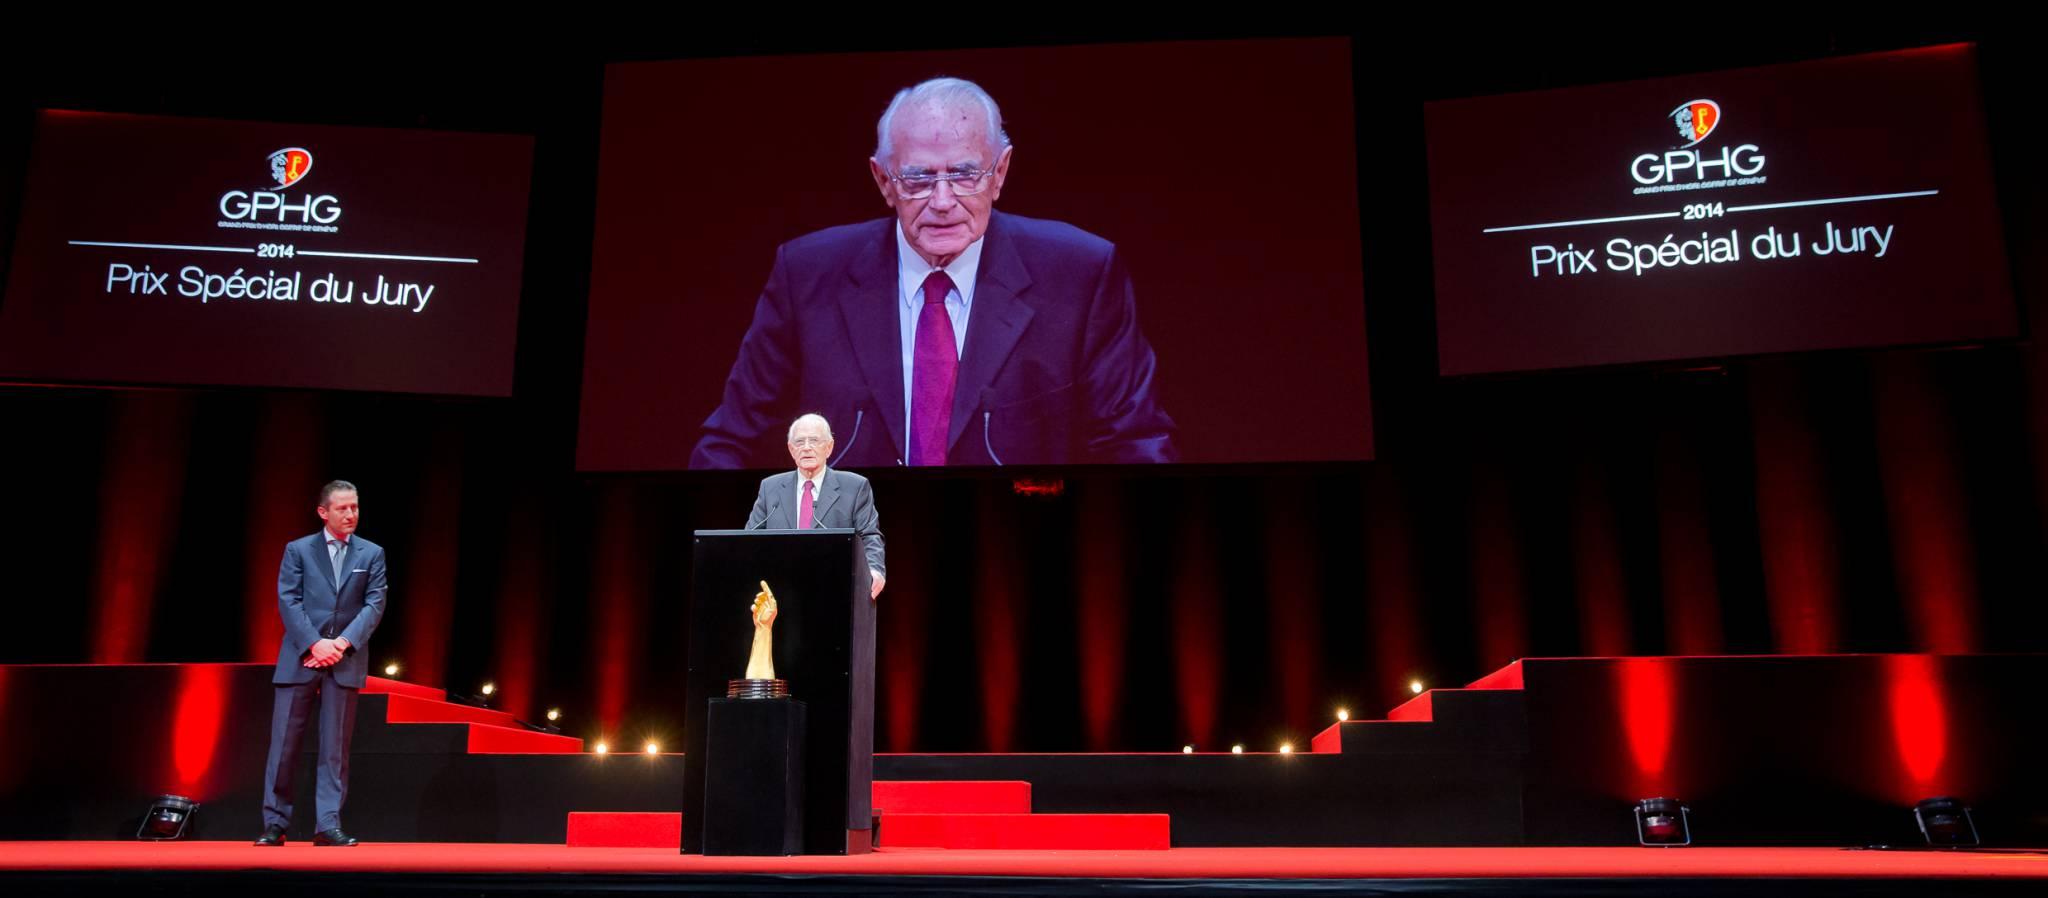 Aurel Bacs (President of the jury) and Walter Lange (Founder of A. Lange & Söhne)